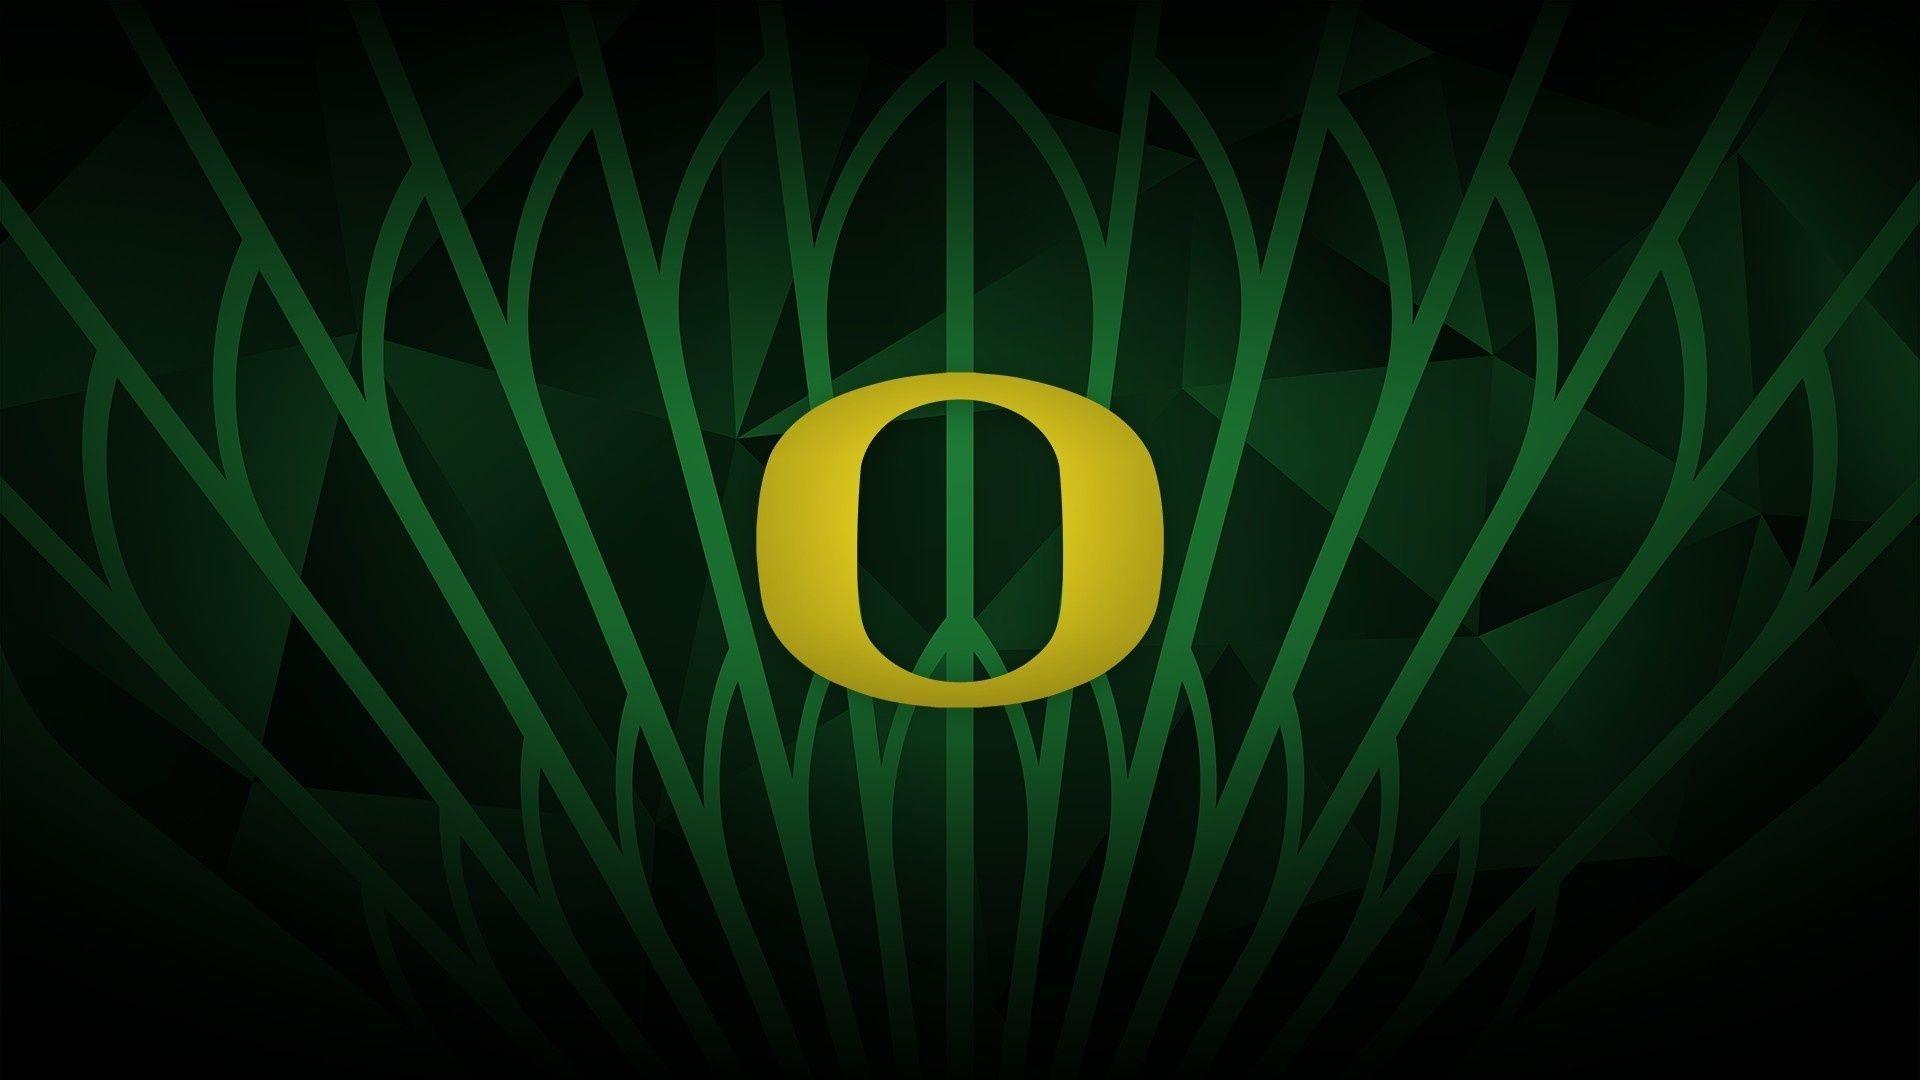 Oregon Football Wallpapers - Top Free